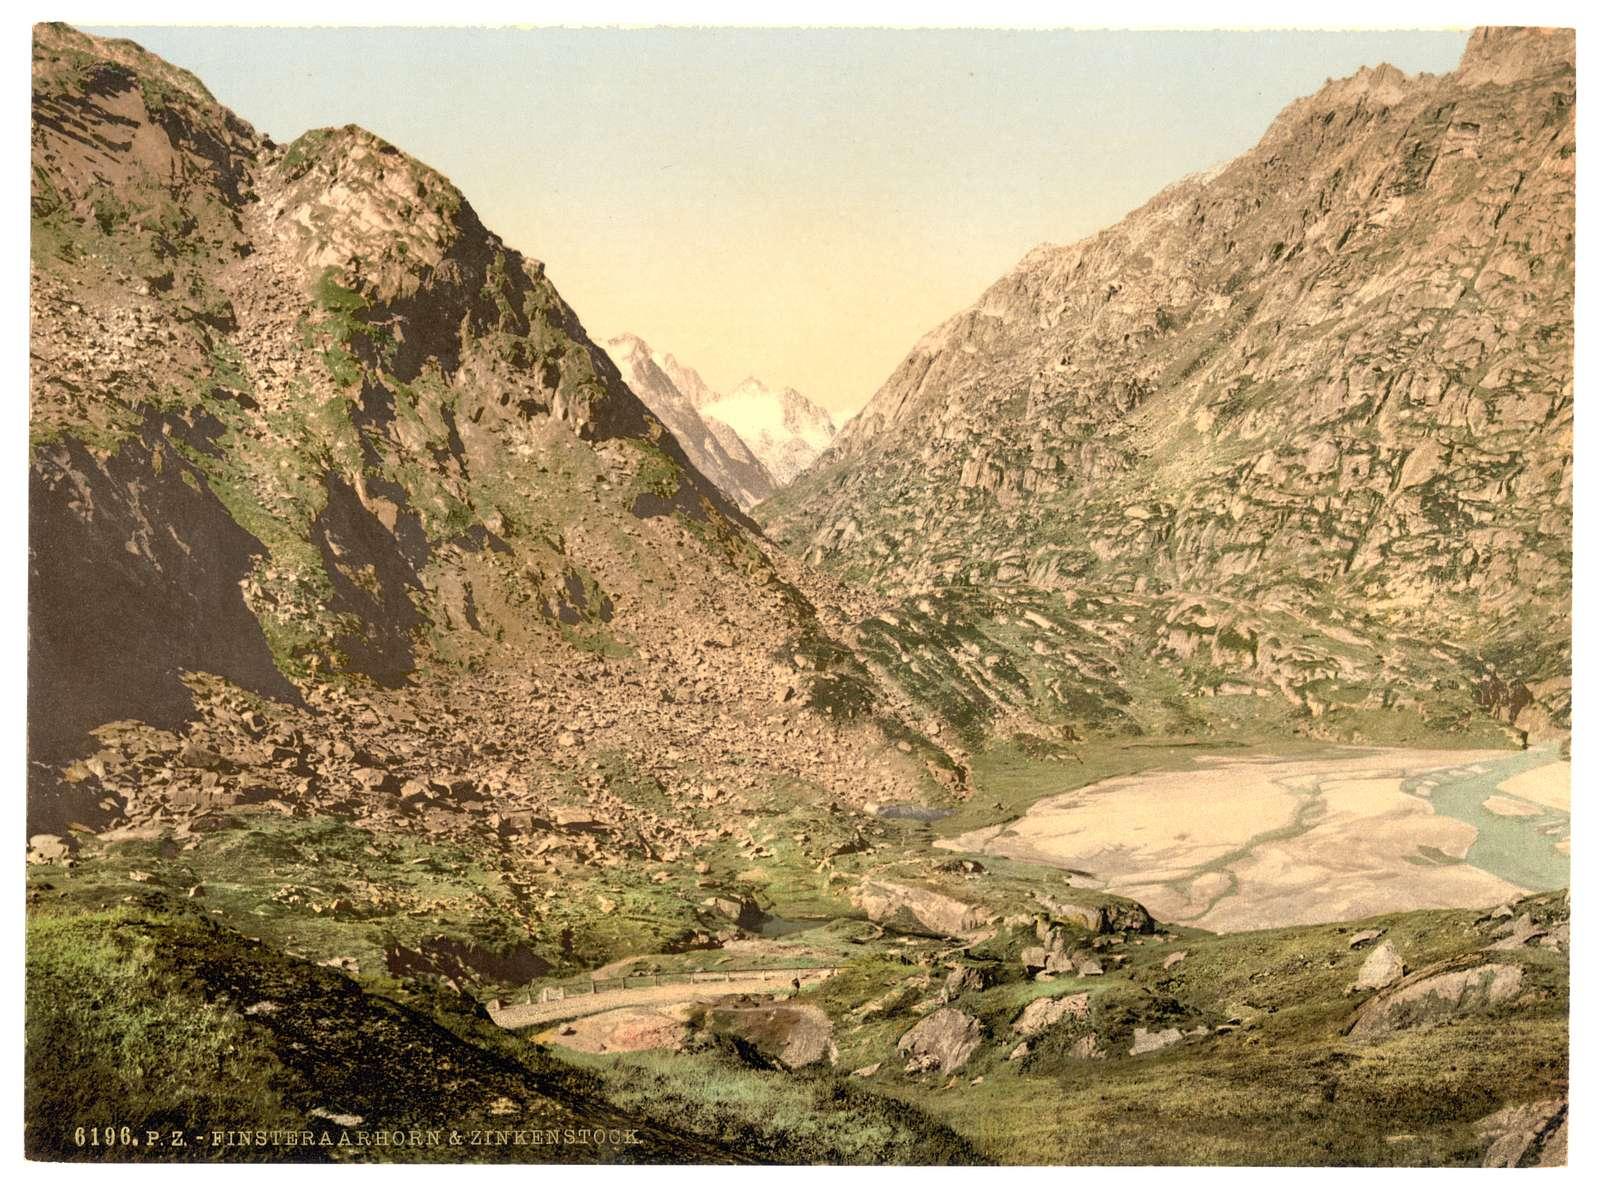 [Grimselstrasse, view on Finsteraarhorn and Zinkenstock, Bernese Oberland, Switzerland]